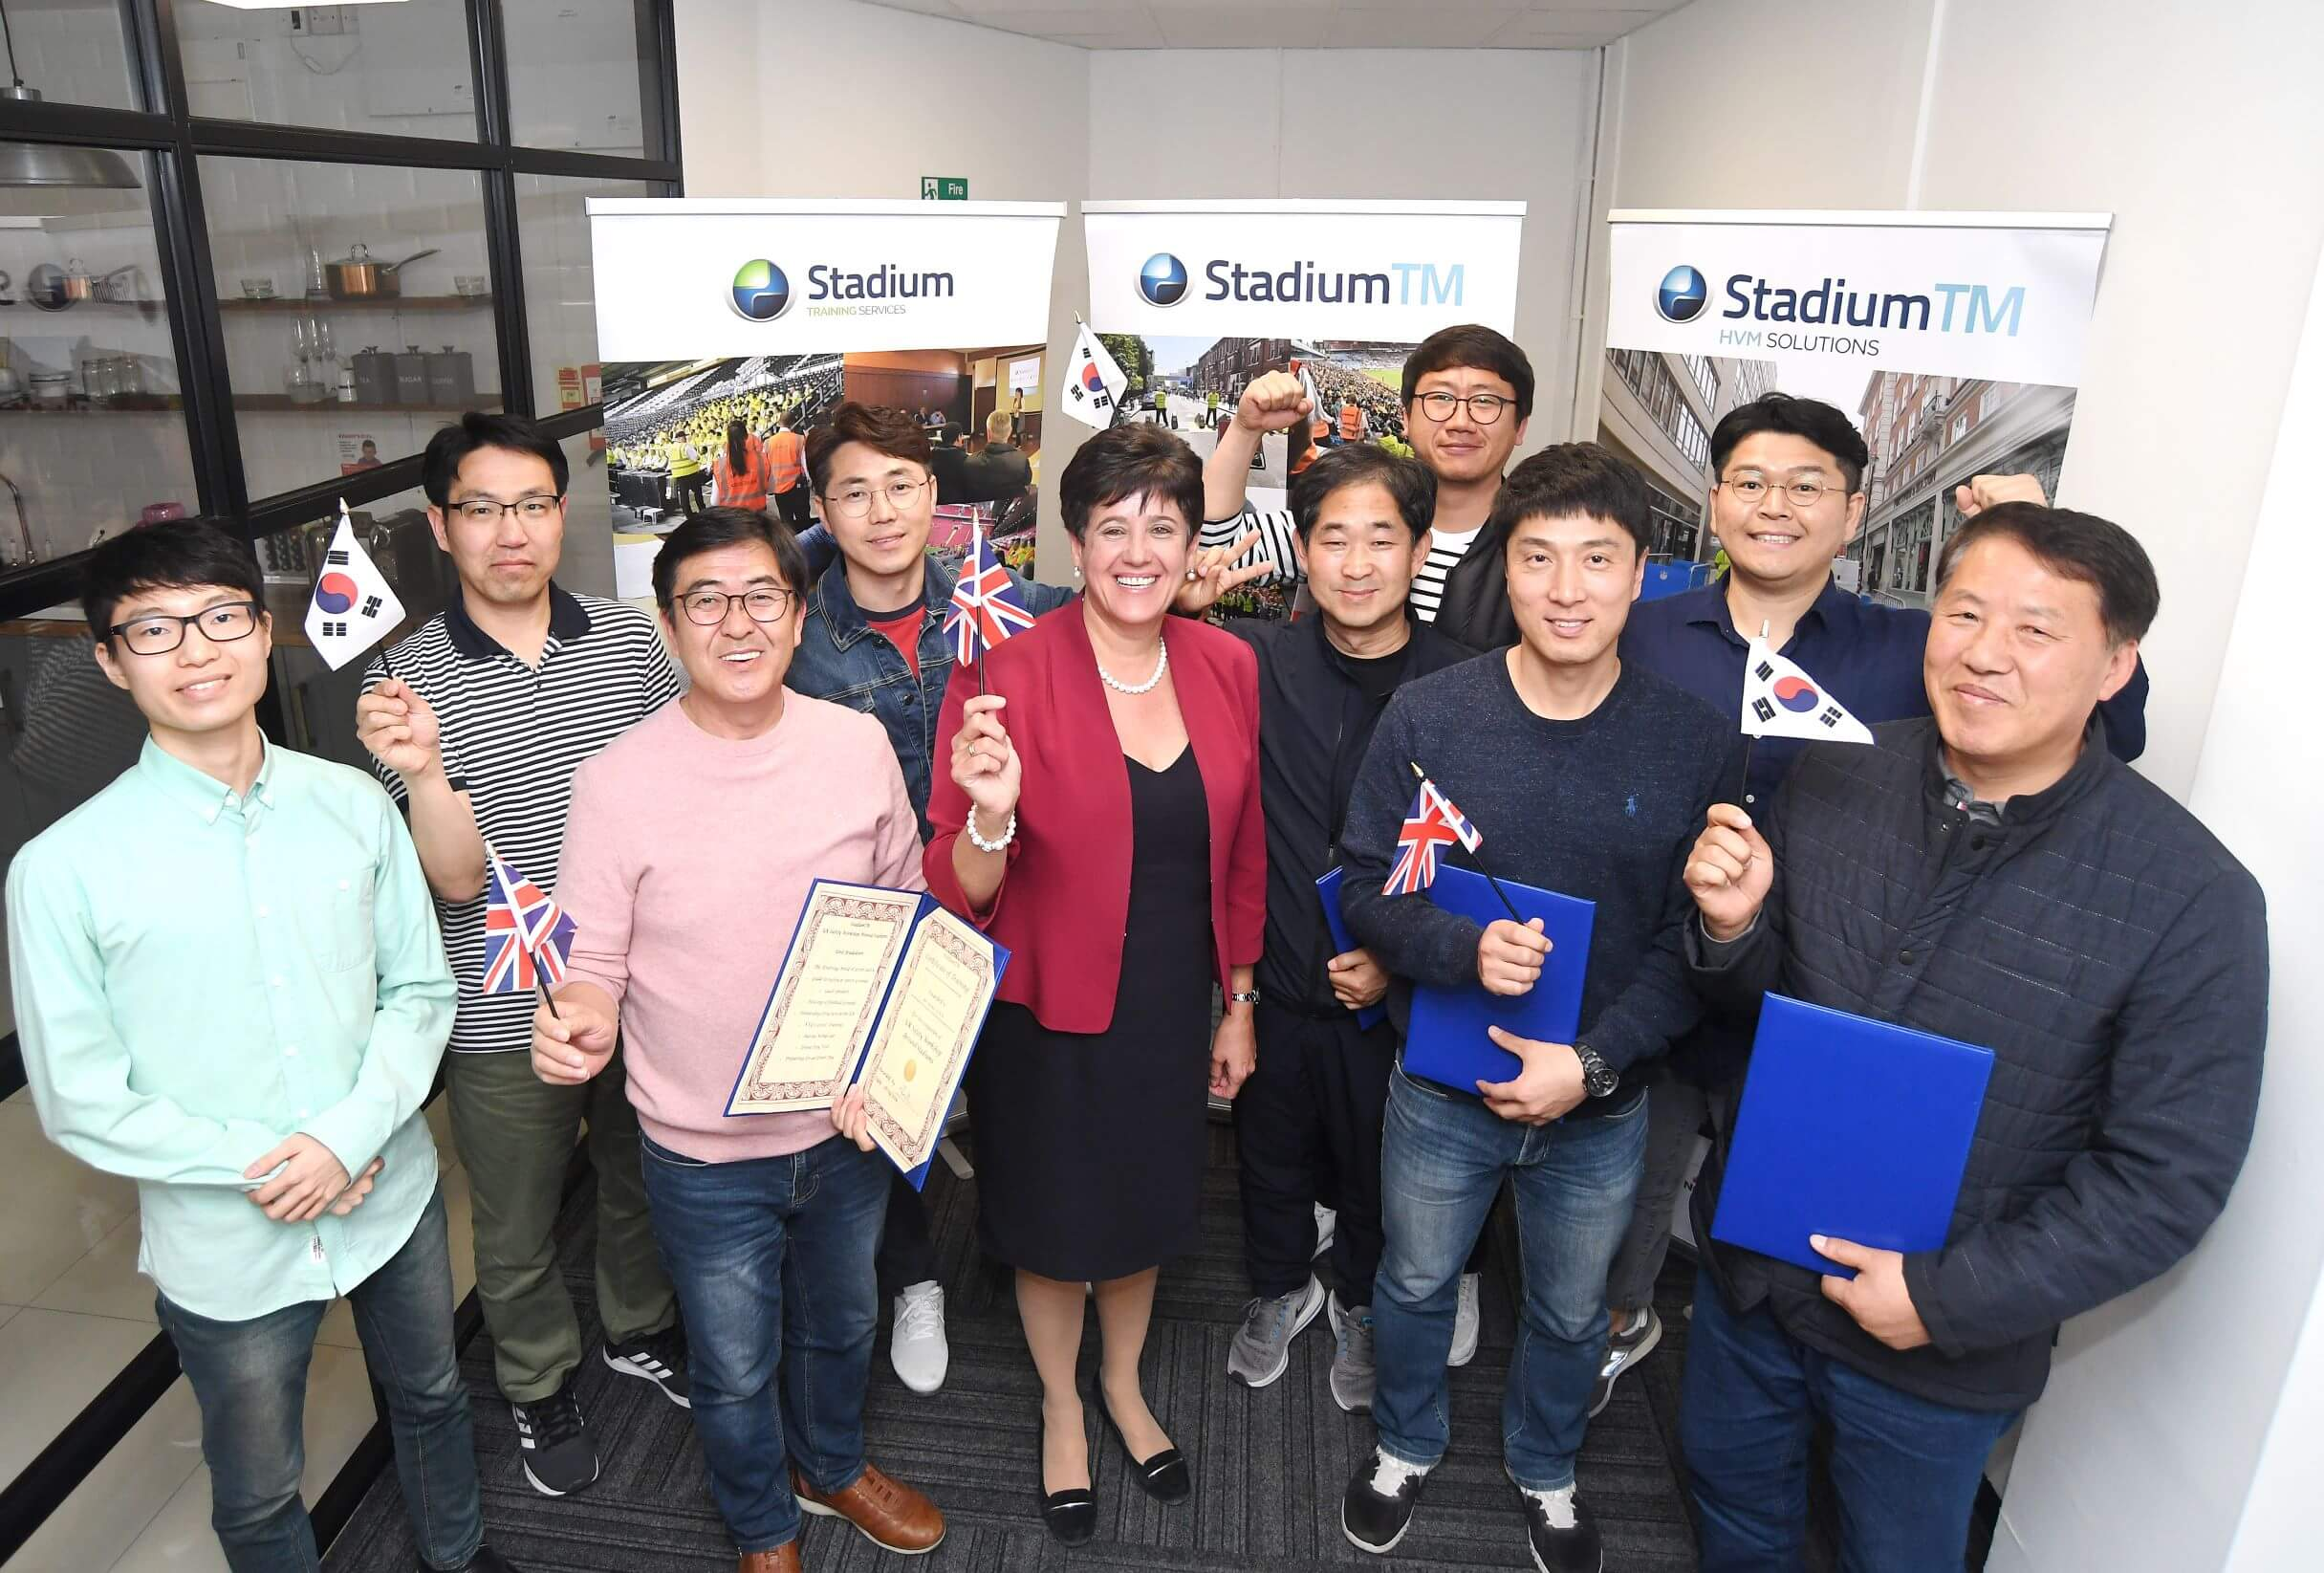 Lorraine Baillie, HR Director at StadiumTM (centre) and all KSPO delegates